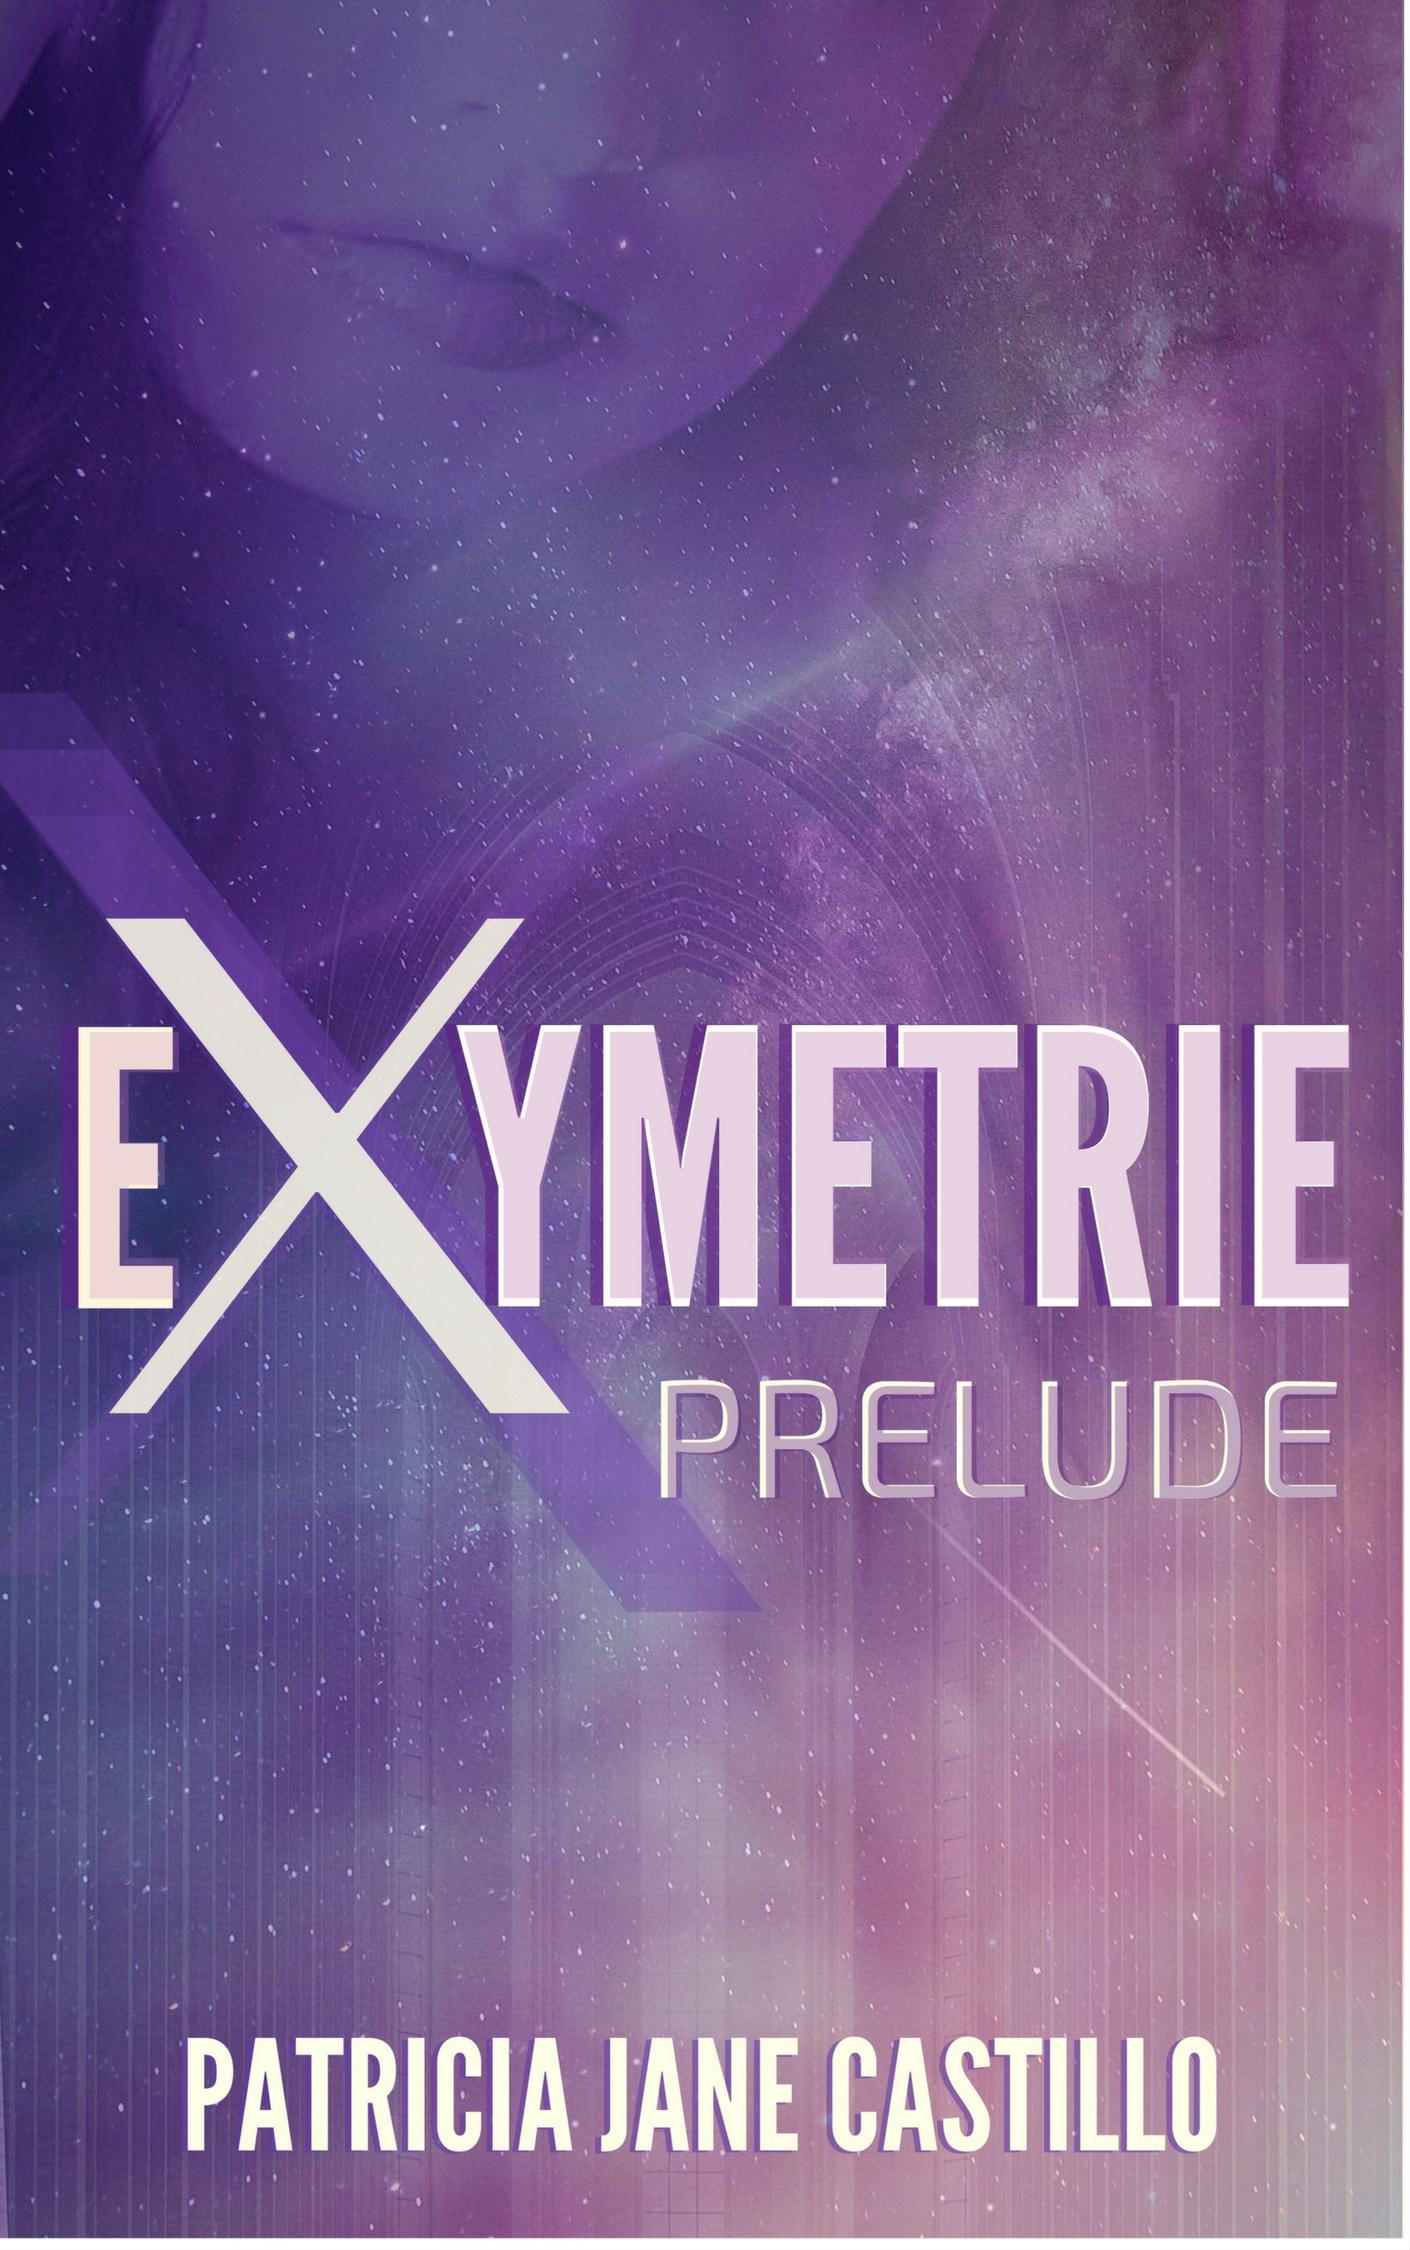 Patricia Jane Castillo – Exymetrie Prelude